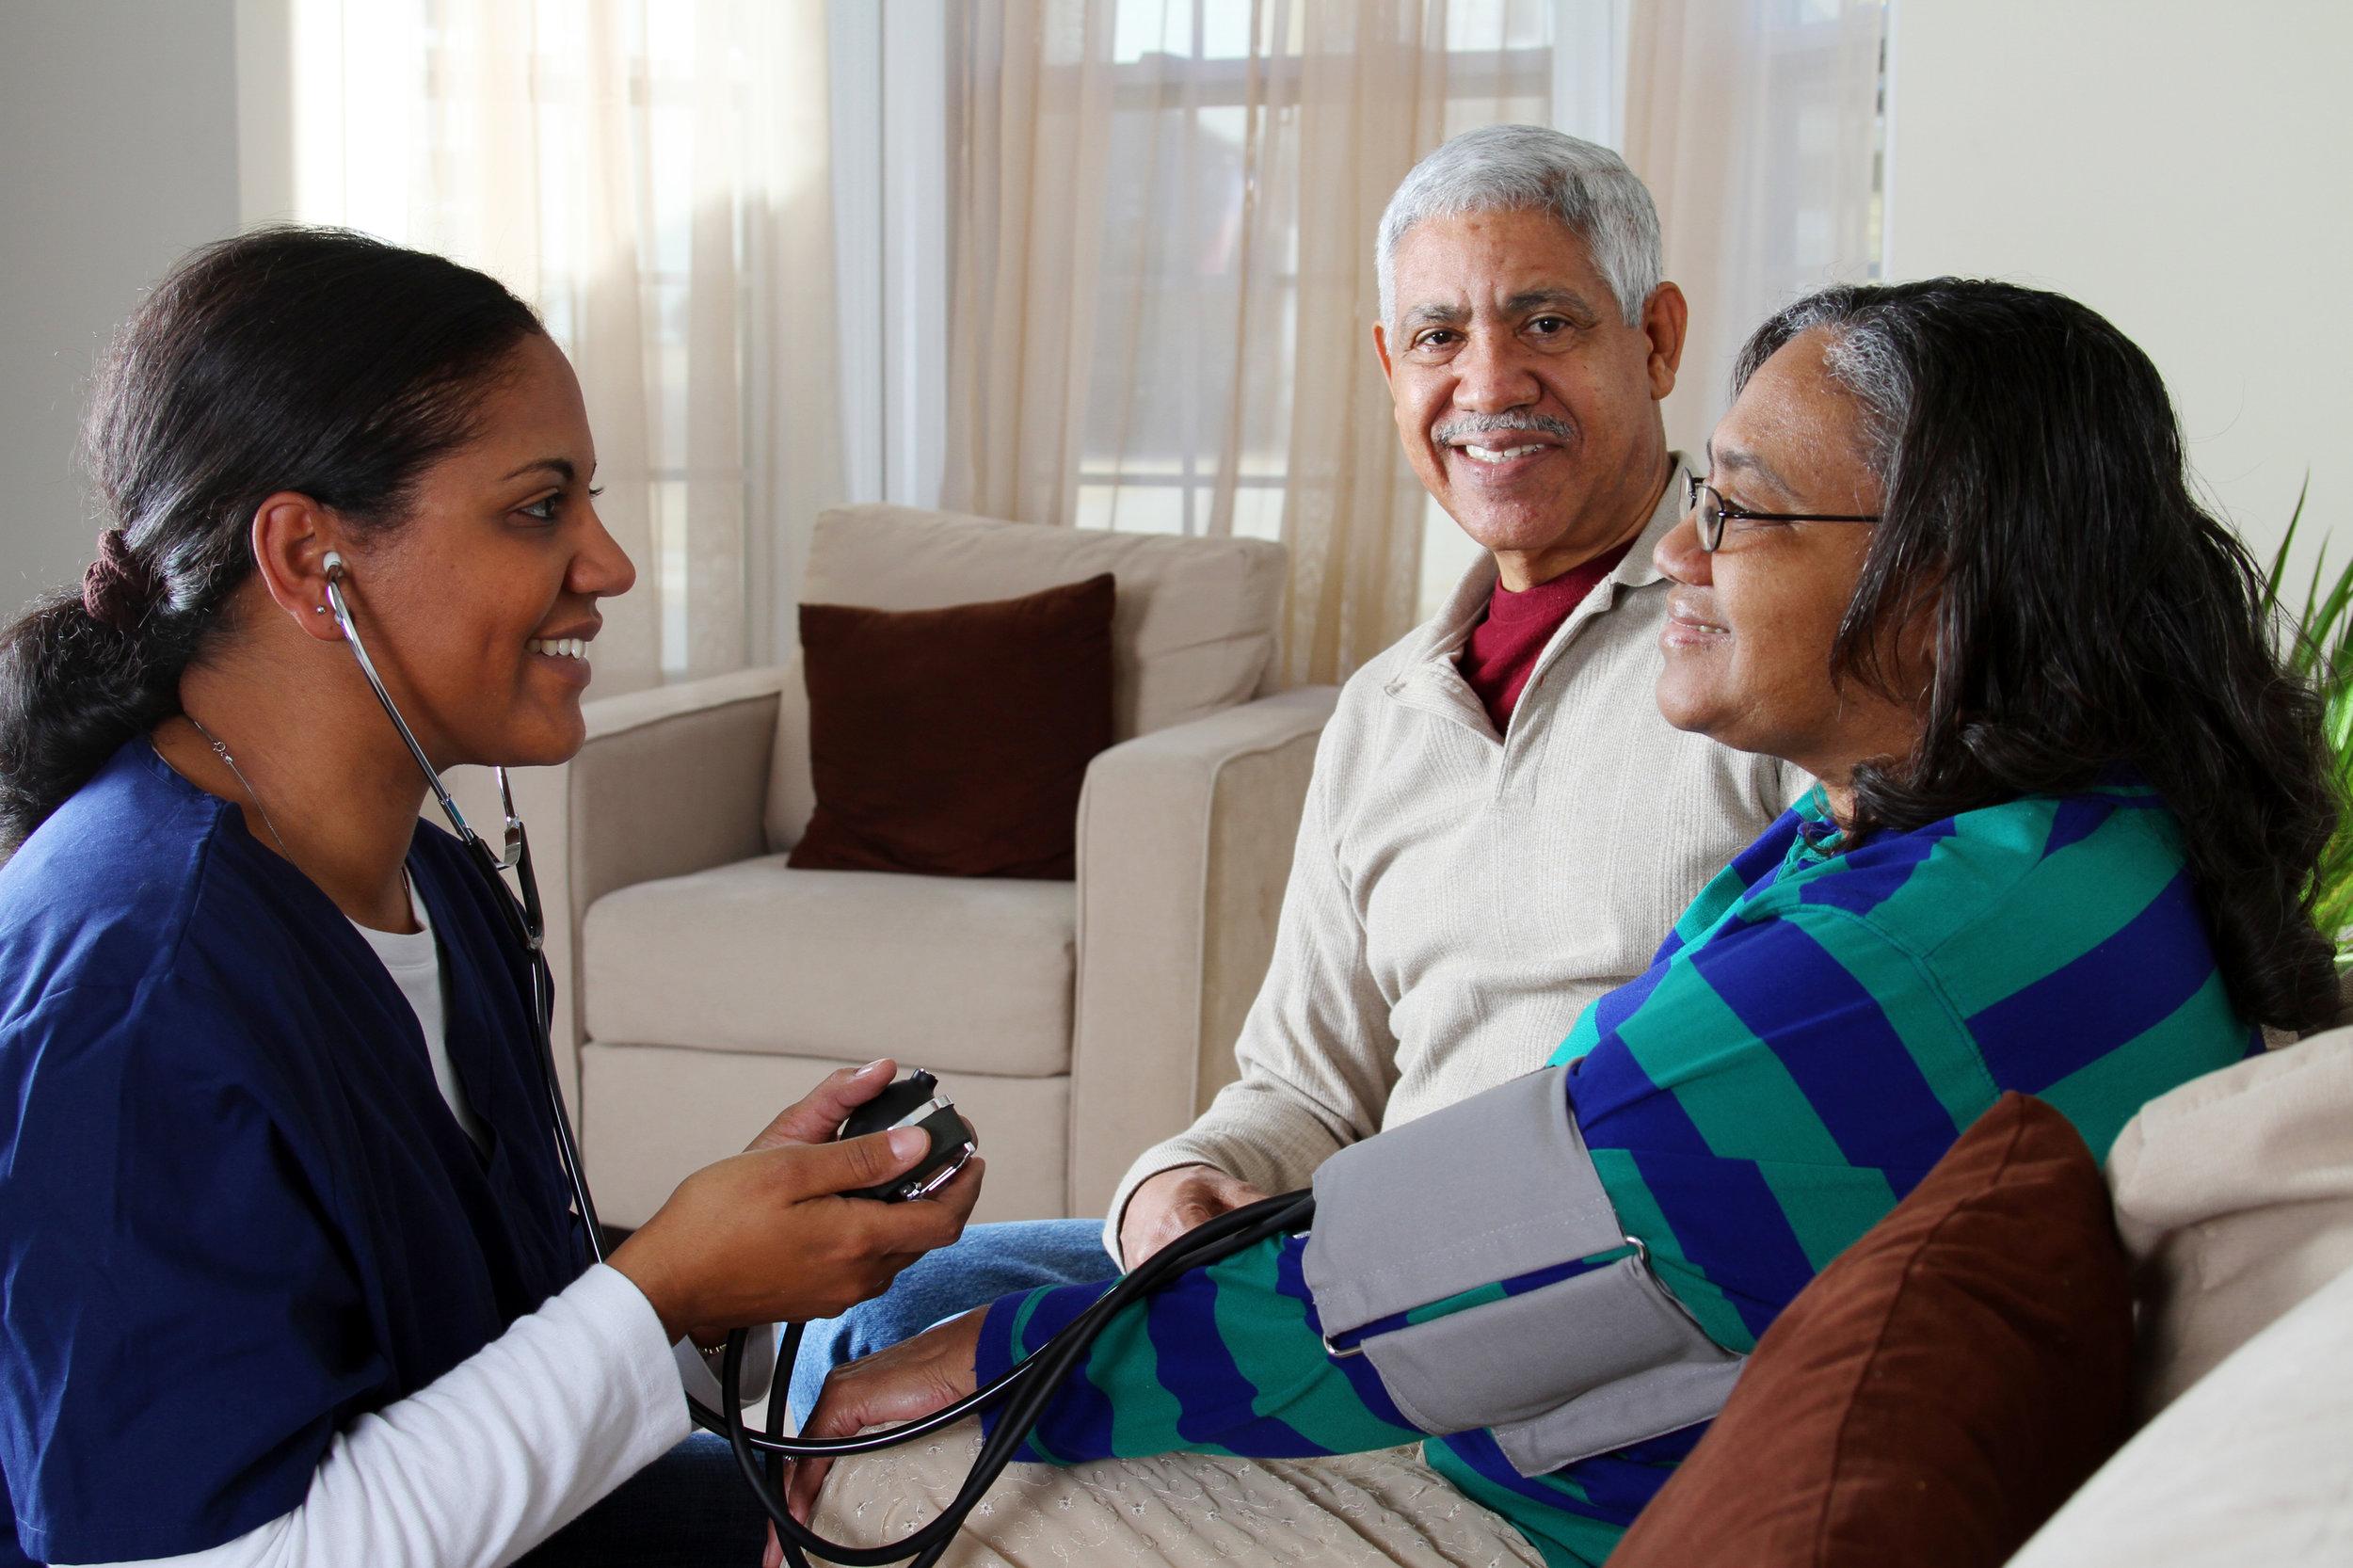 home-health-care-18354786.jpg